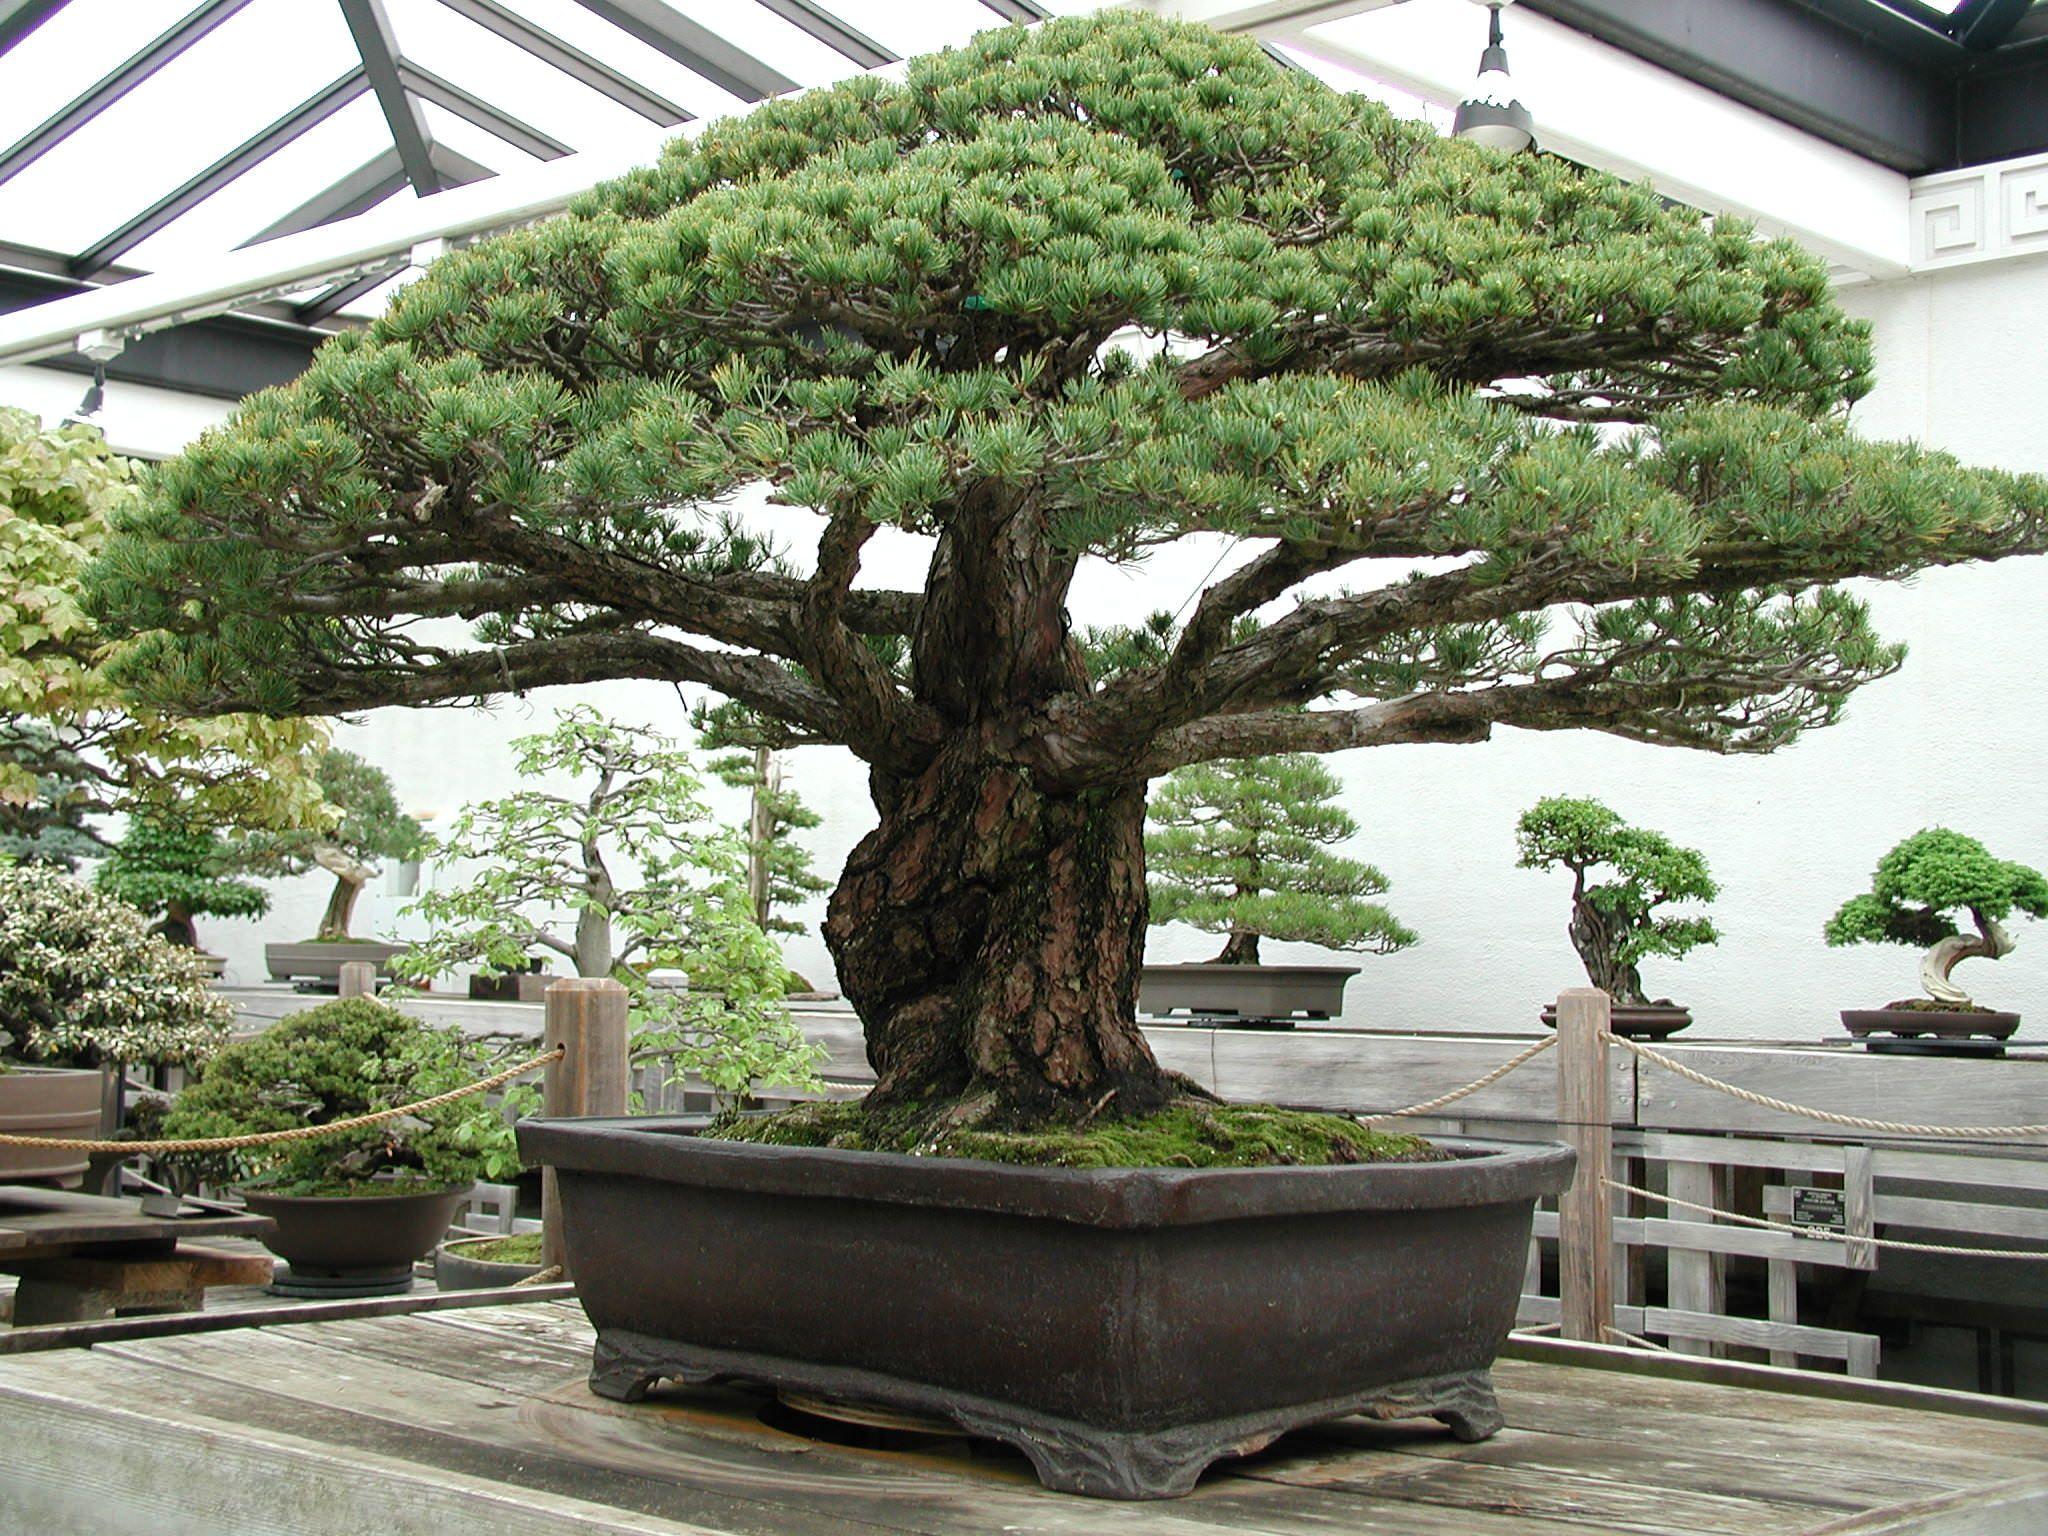 Home Garden Balcony Bonsai Plant Chamaecyparis Pisifera Seeds Aquatic Plants